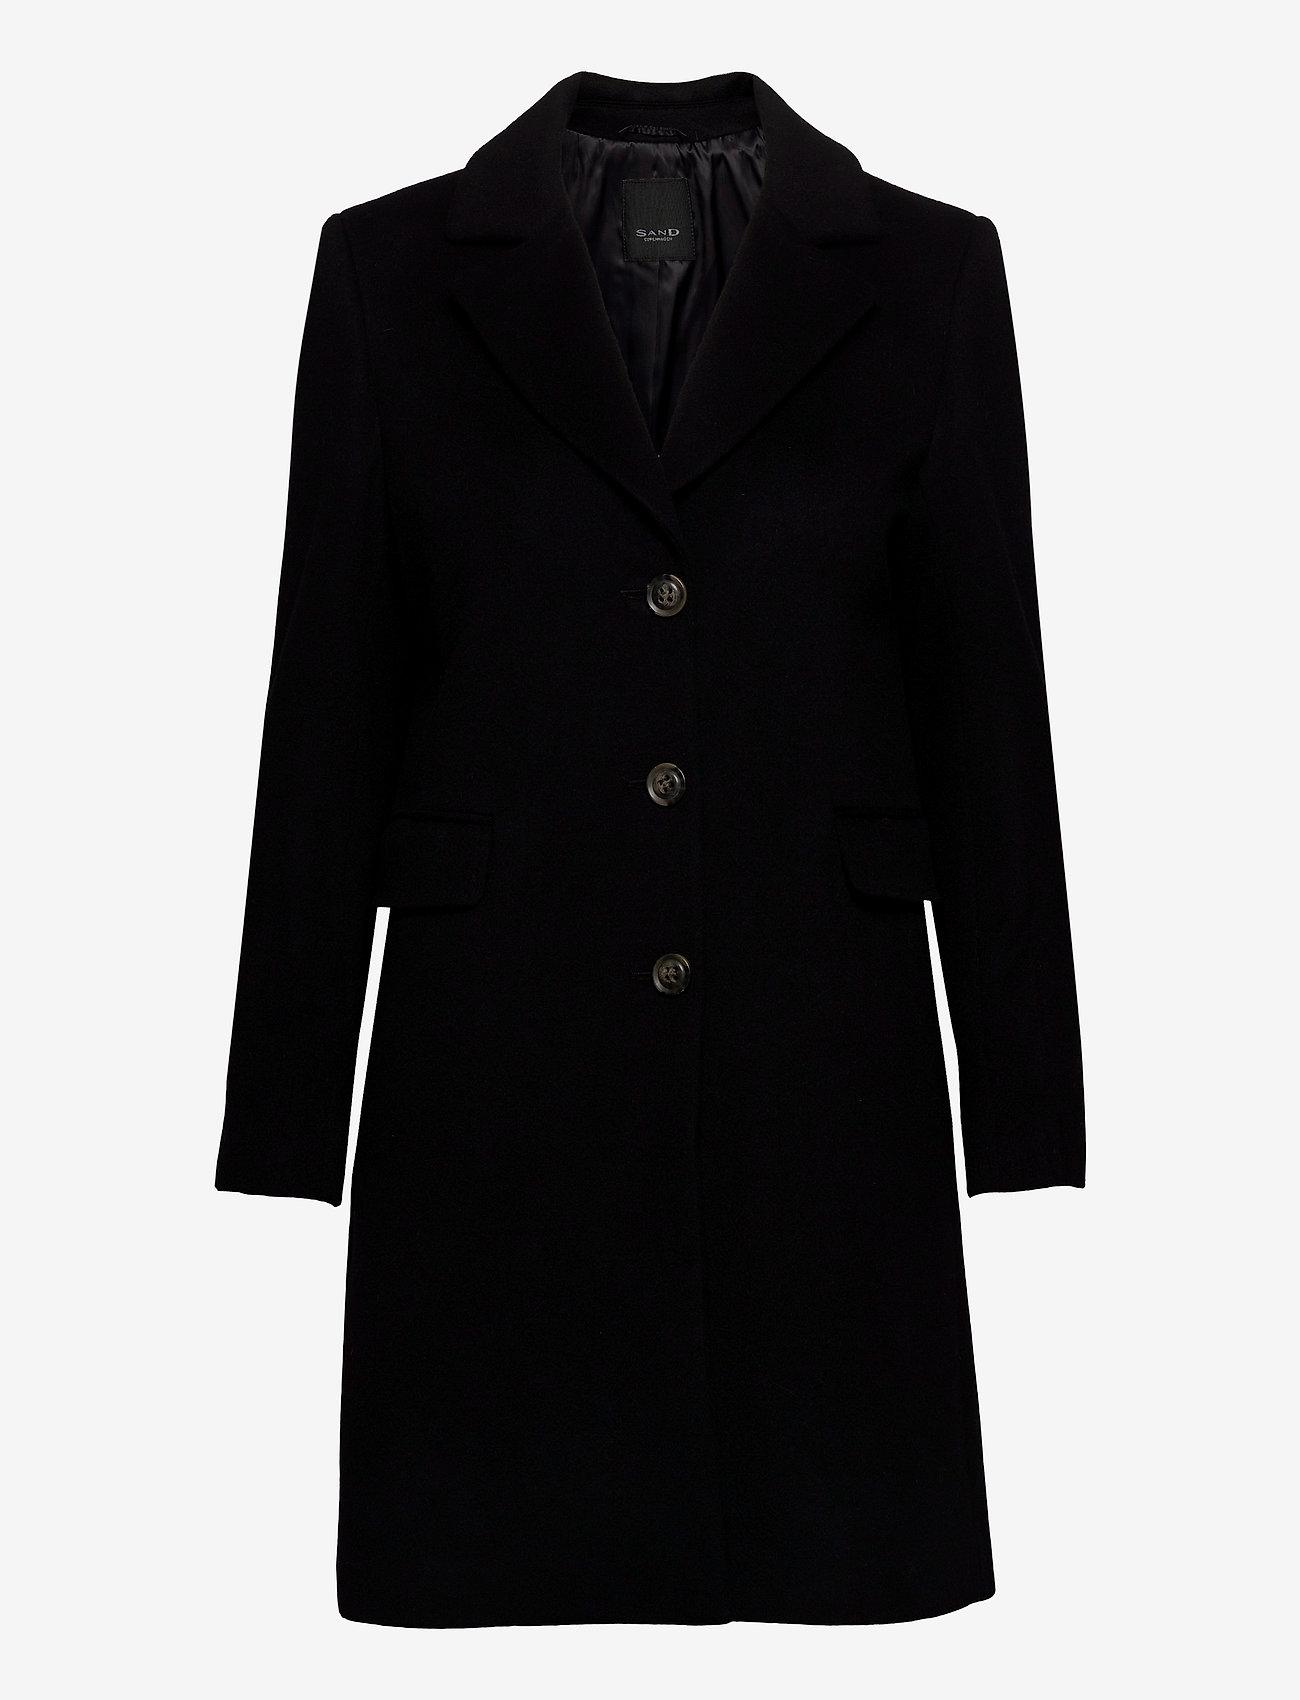 SAND - Cashmere Coat W - Britni 2 - black - 0